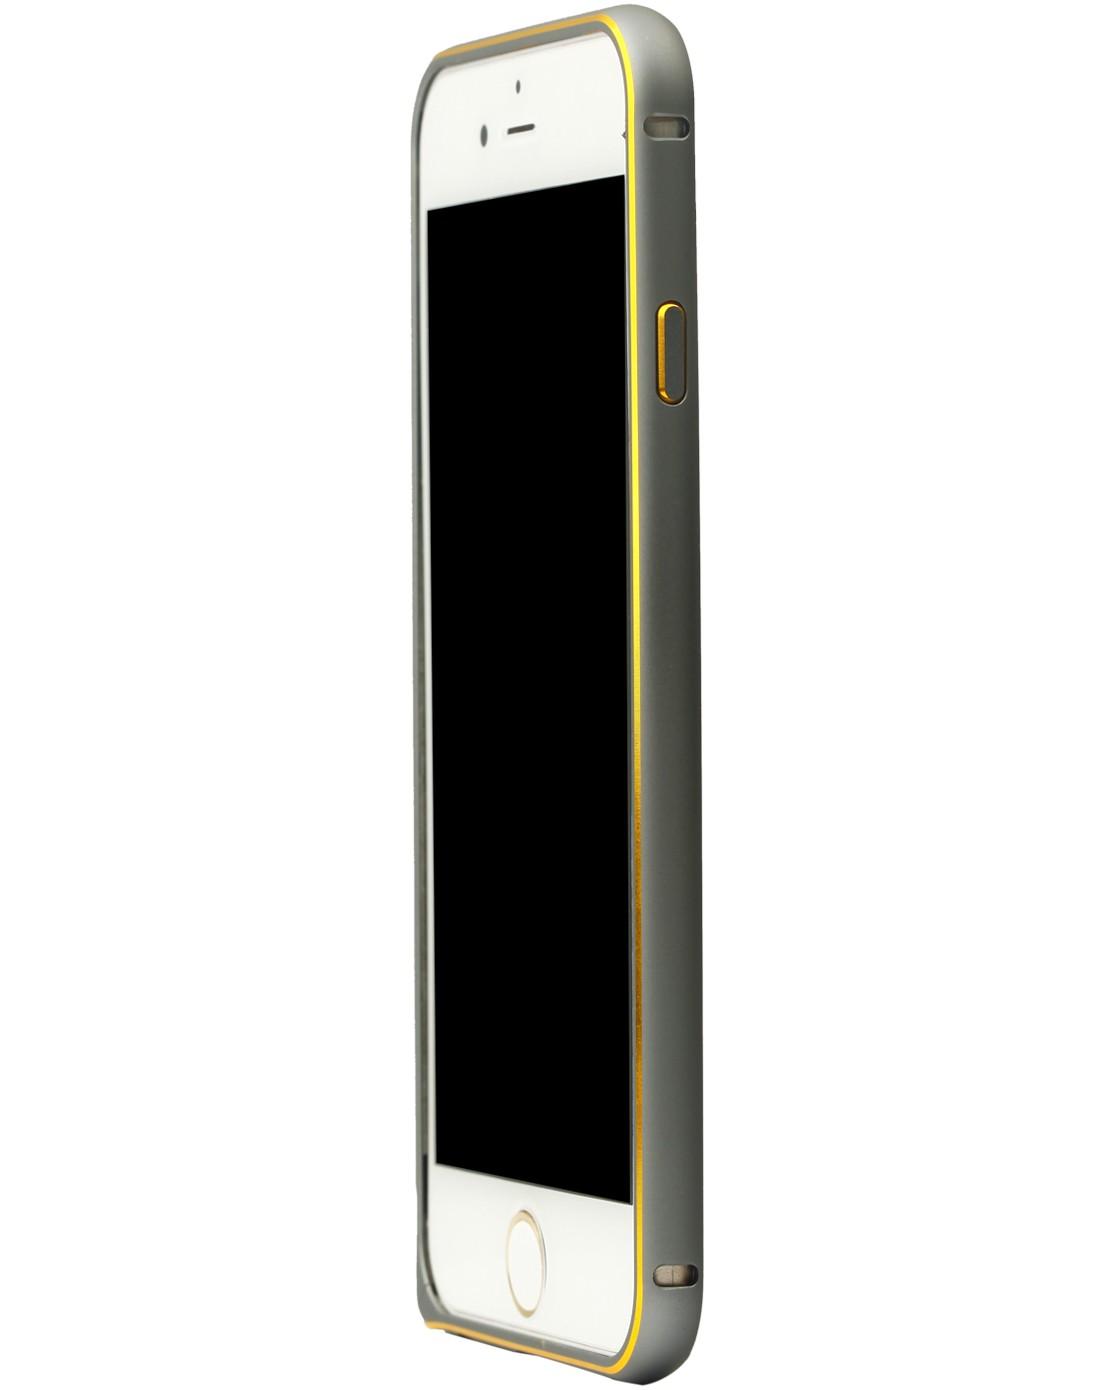 iphone6金属边框5.5寸 灰色